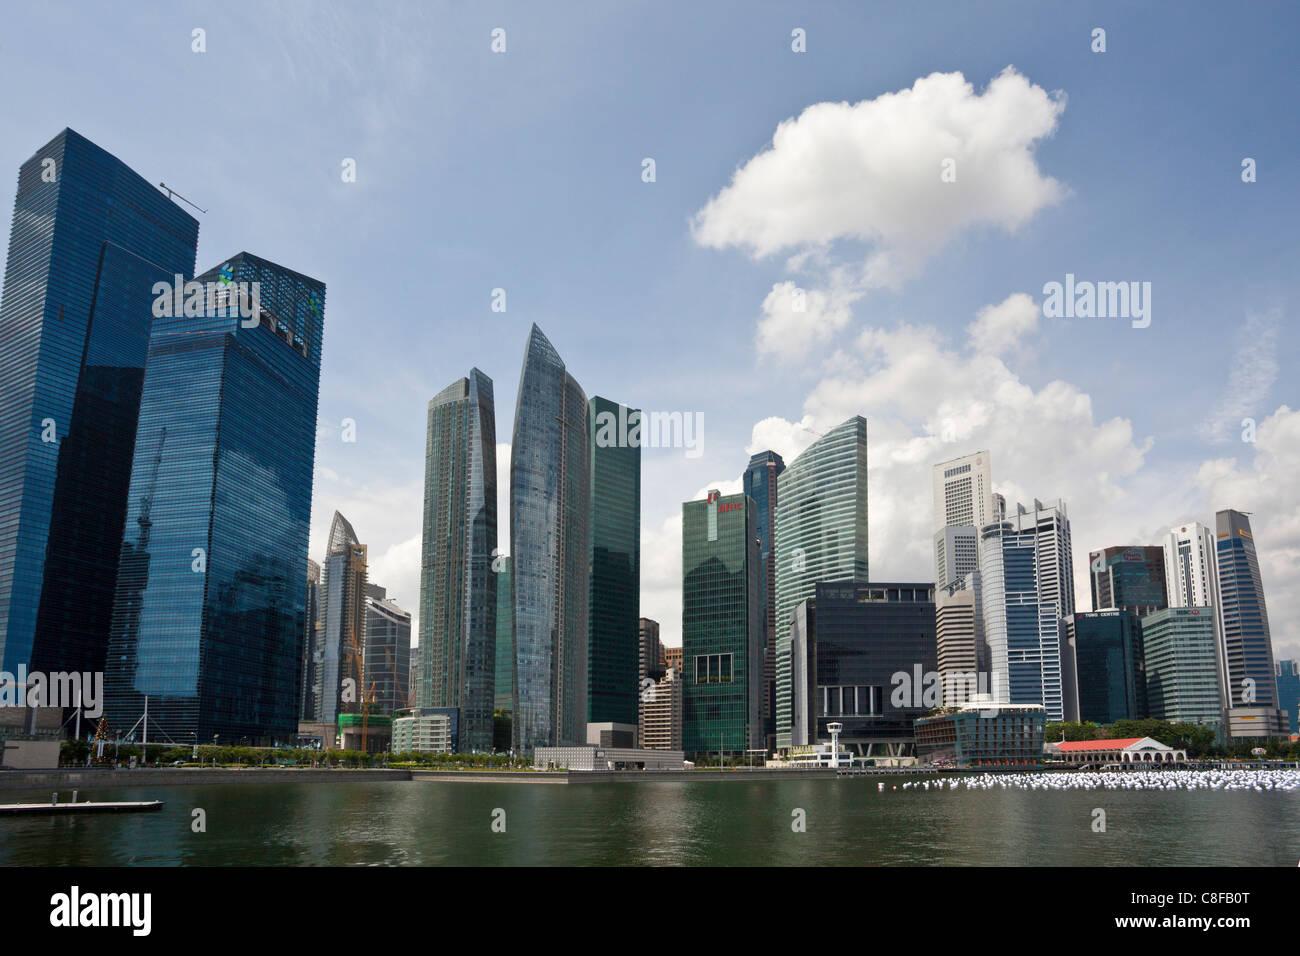 Singapore, Asia, Marina Bay, Skyline, bay, blocks of flats, high-rise buildings, skyscrapers - Stock Image